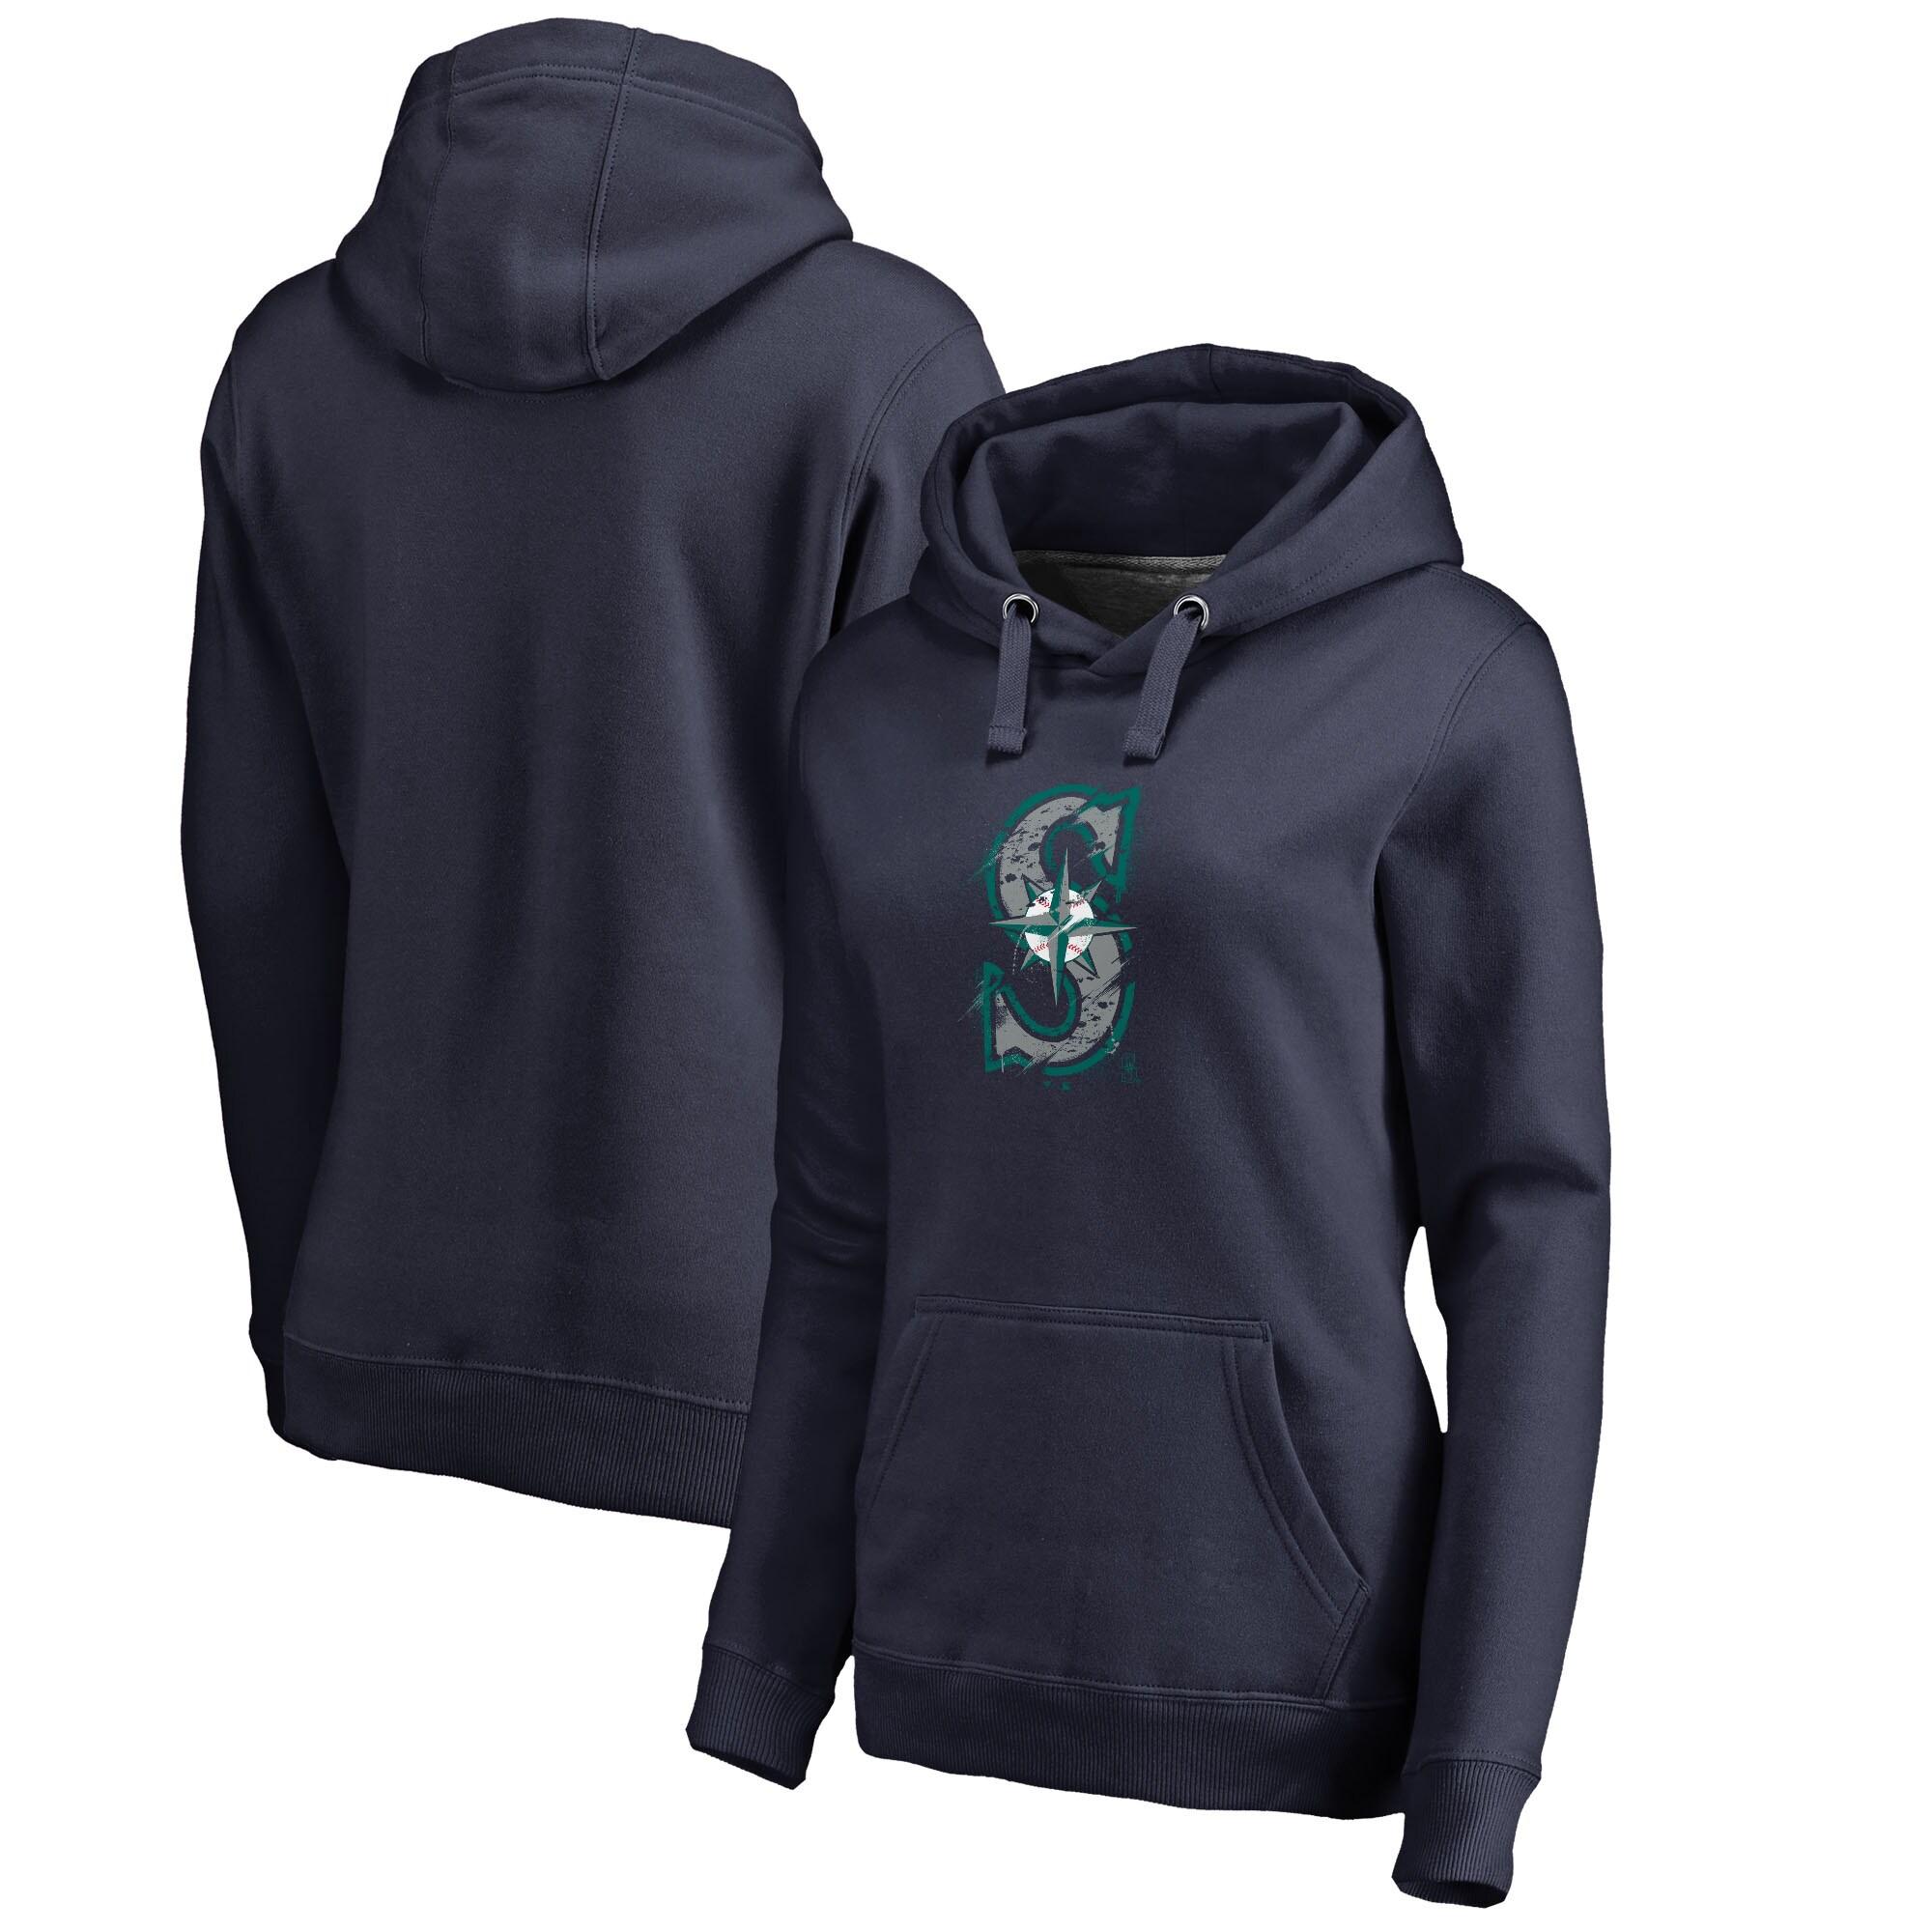 Seattle Mariners Fanatics Branded Women's Splatter Logo Pullover Hoodie - Navy